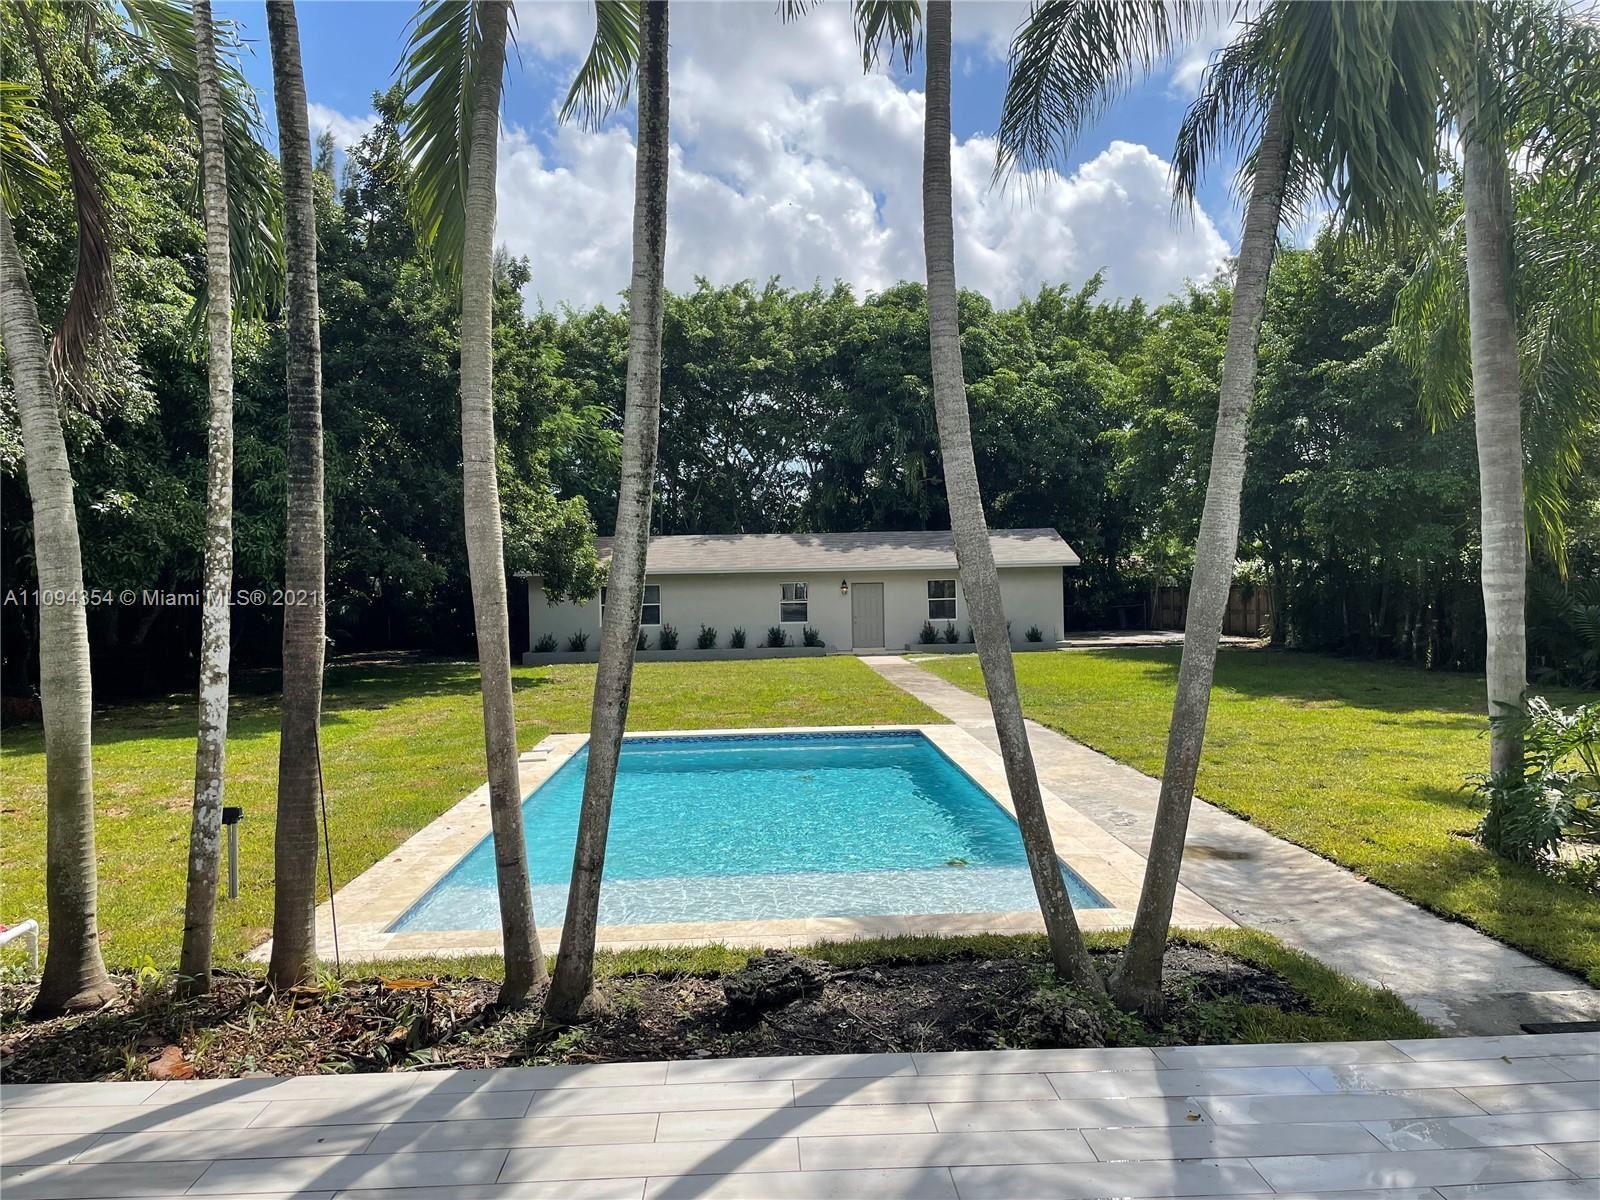 8472 Miller Dr, Miami, FL 33155 - #: A11094354